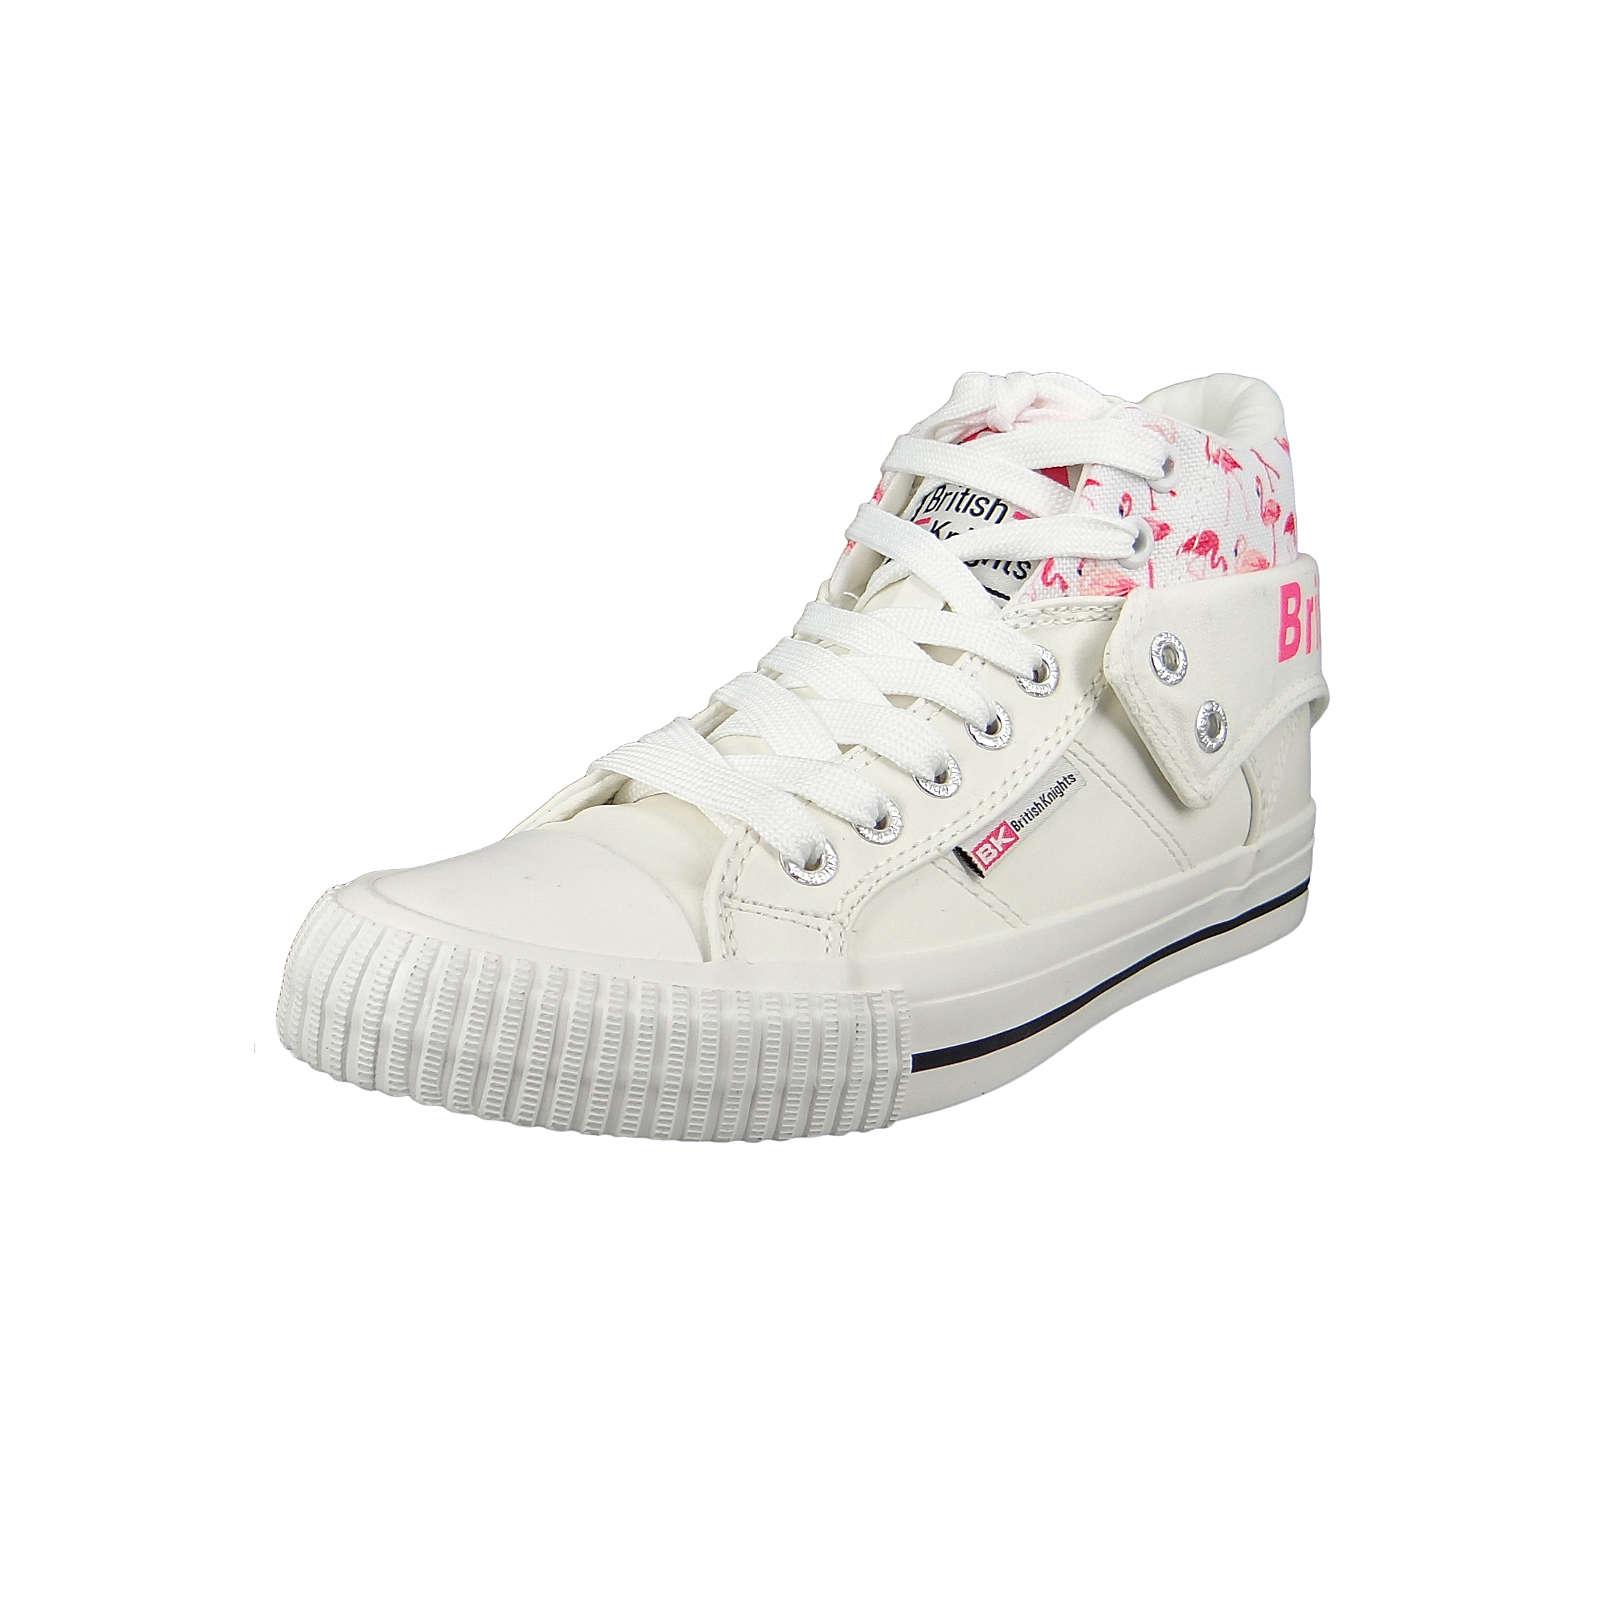 British Knights Sneaker B43-3704-01 White Pink Flamingo Weiss Sneakers High weiß Damen Gr. 36